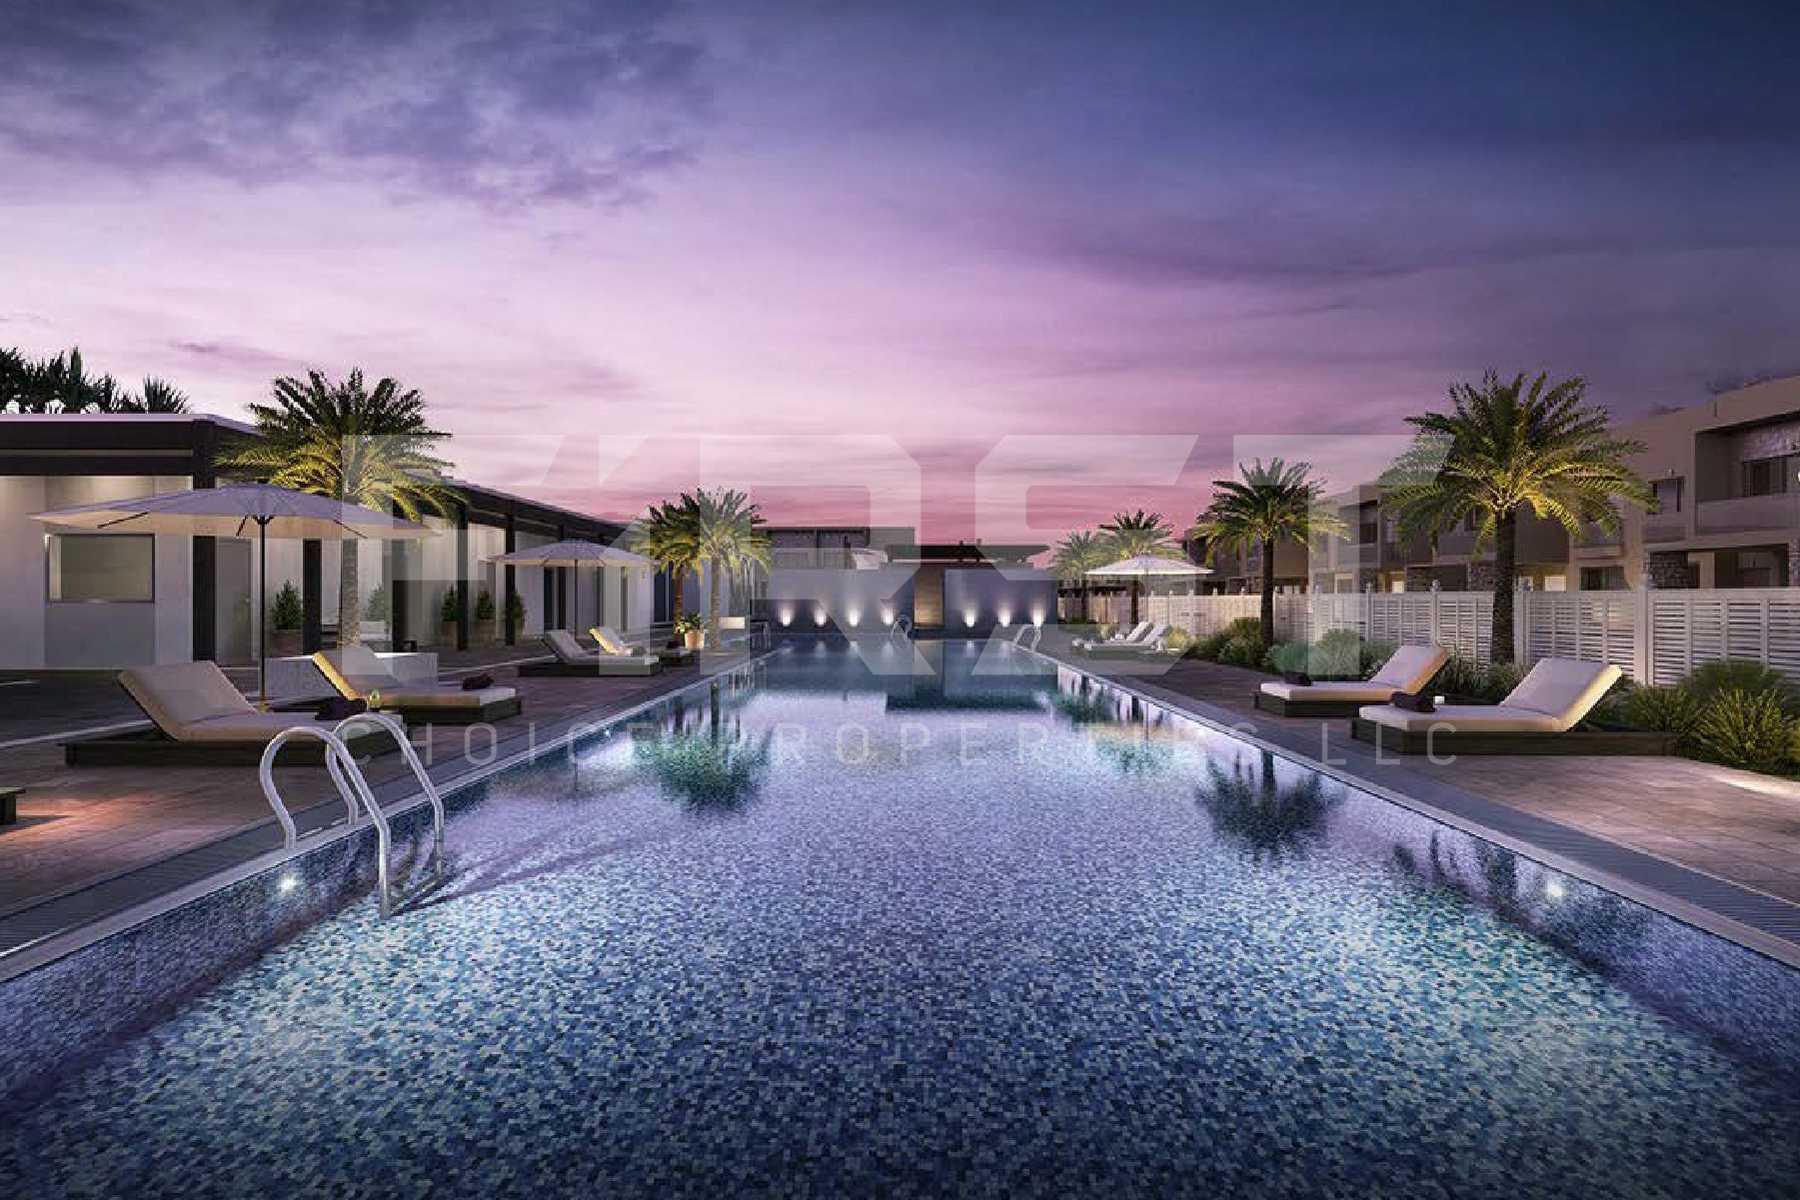 External Photo of Yas Acres Yas Island Abu Dhabi UAE (7).jpg